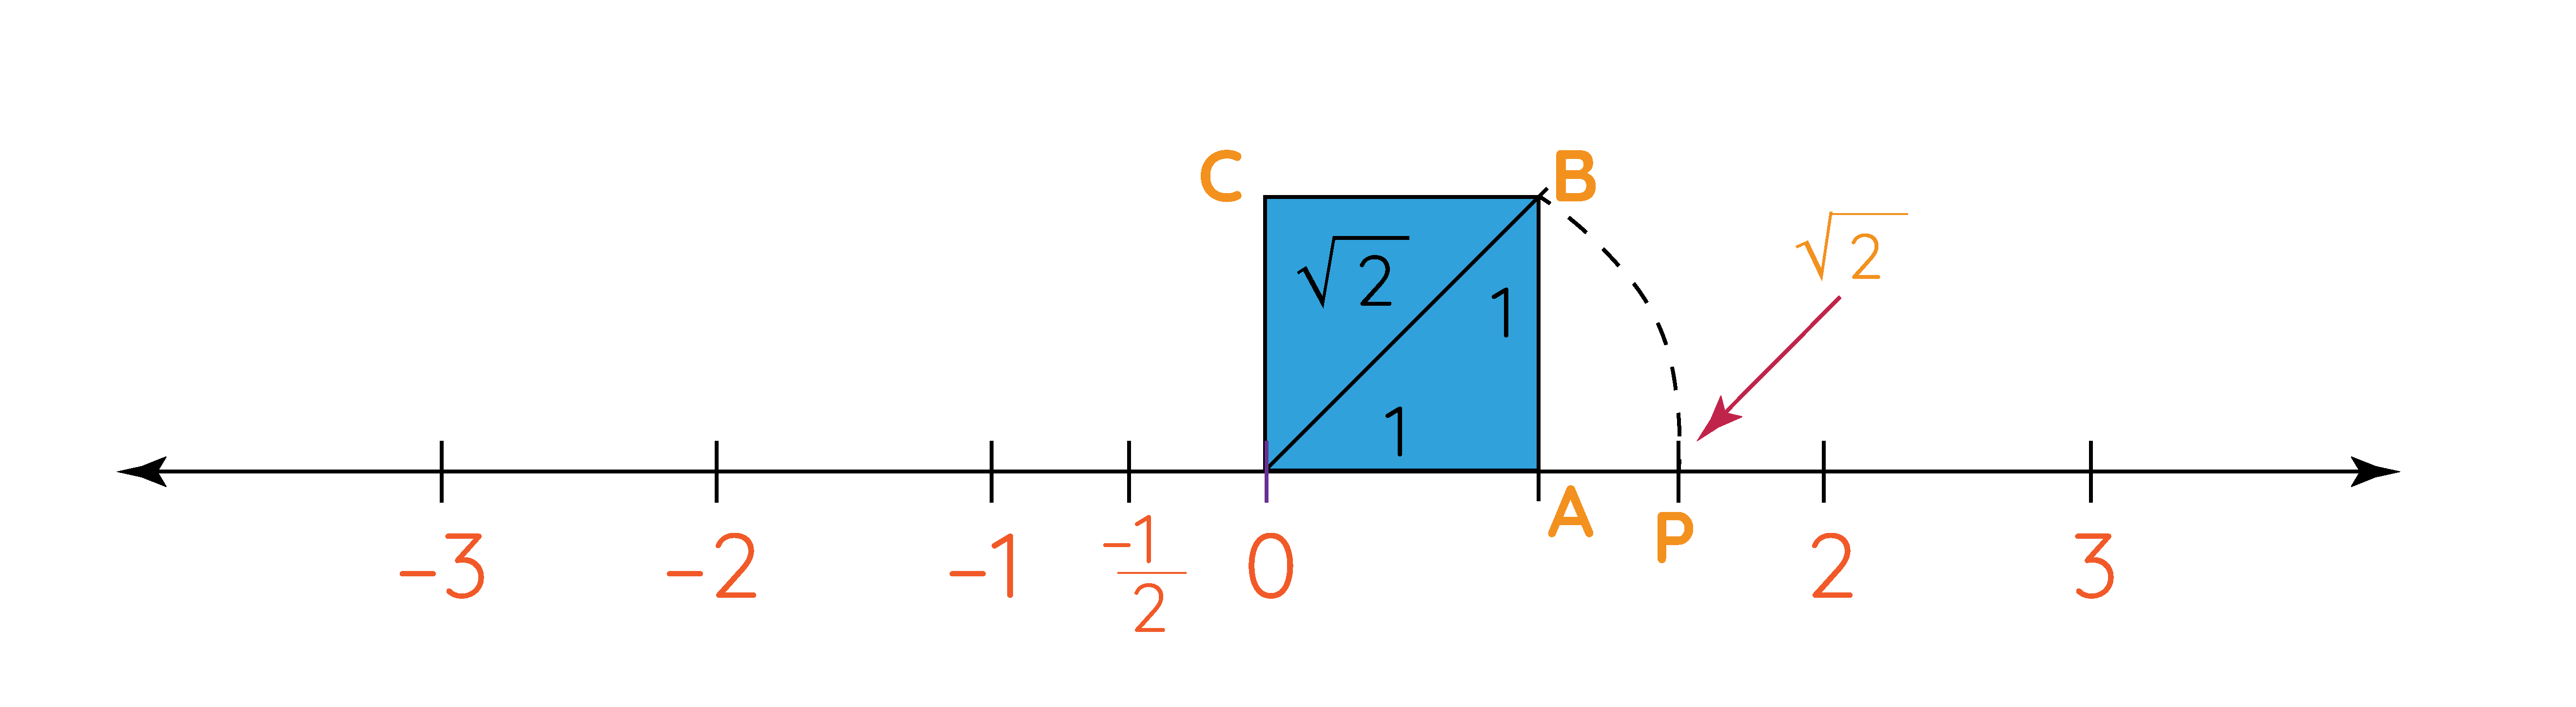 √2 on number line